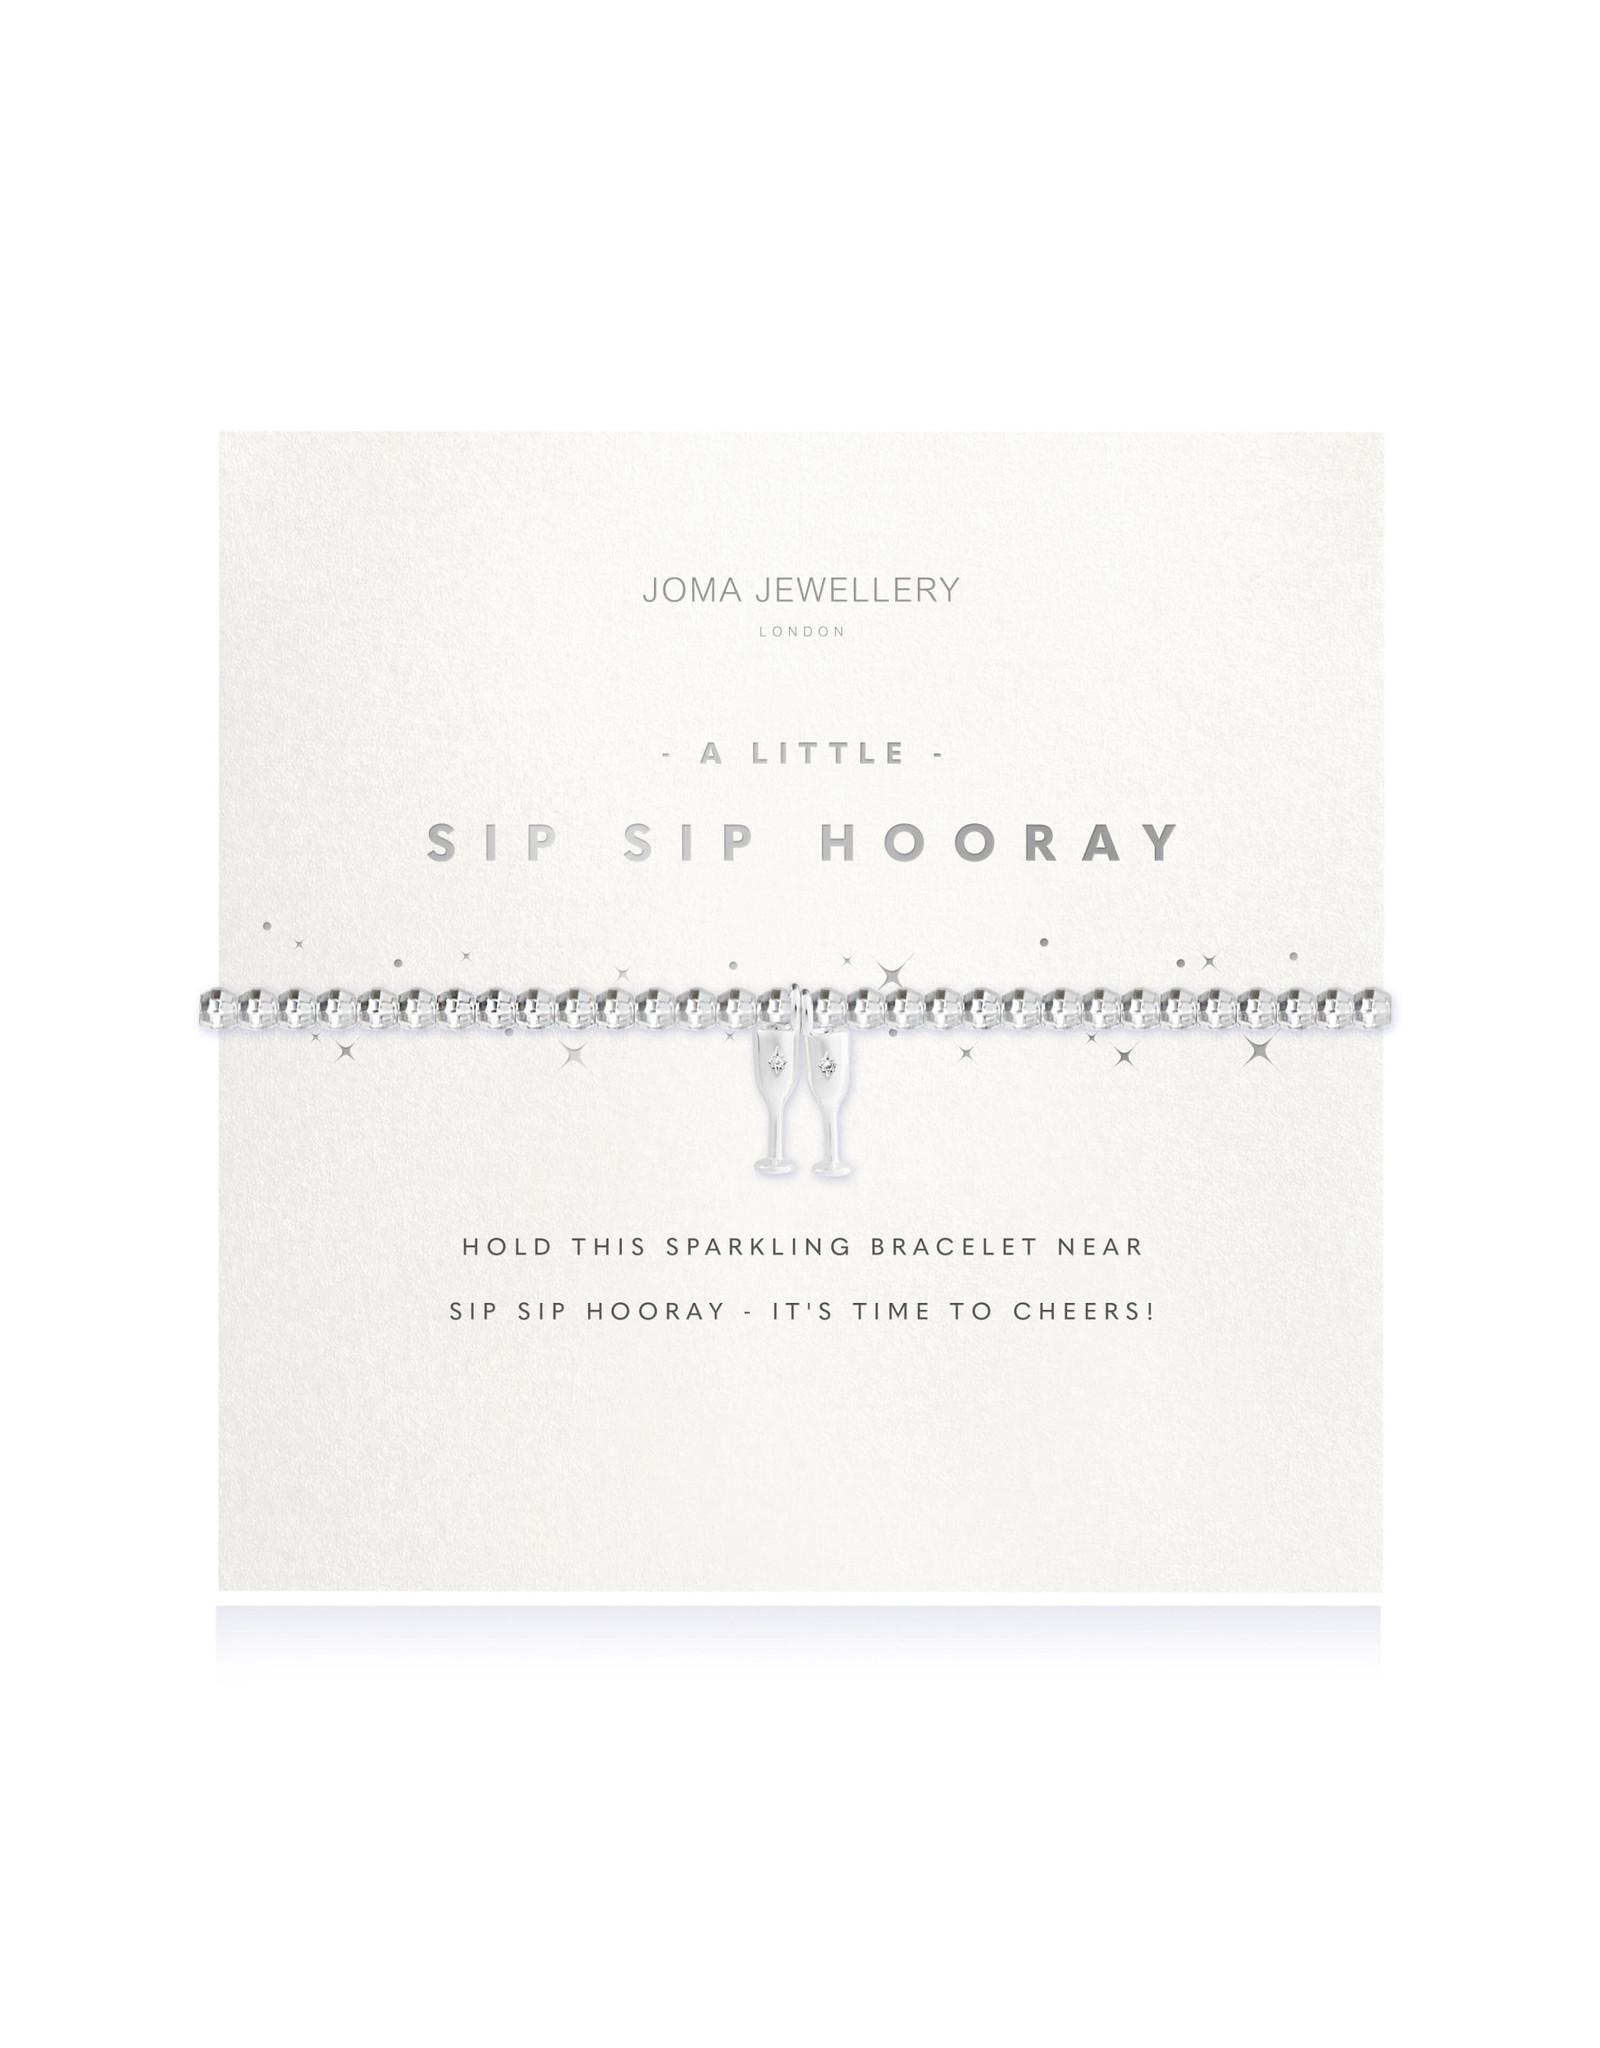 Joma Jewellery A Little - Sip Sip Hooray - Armband